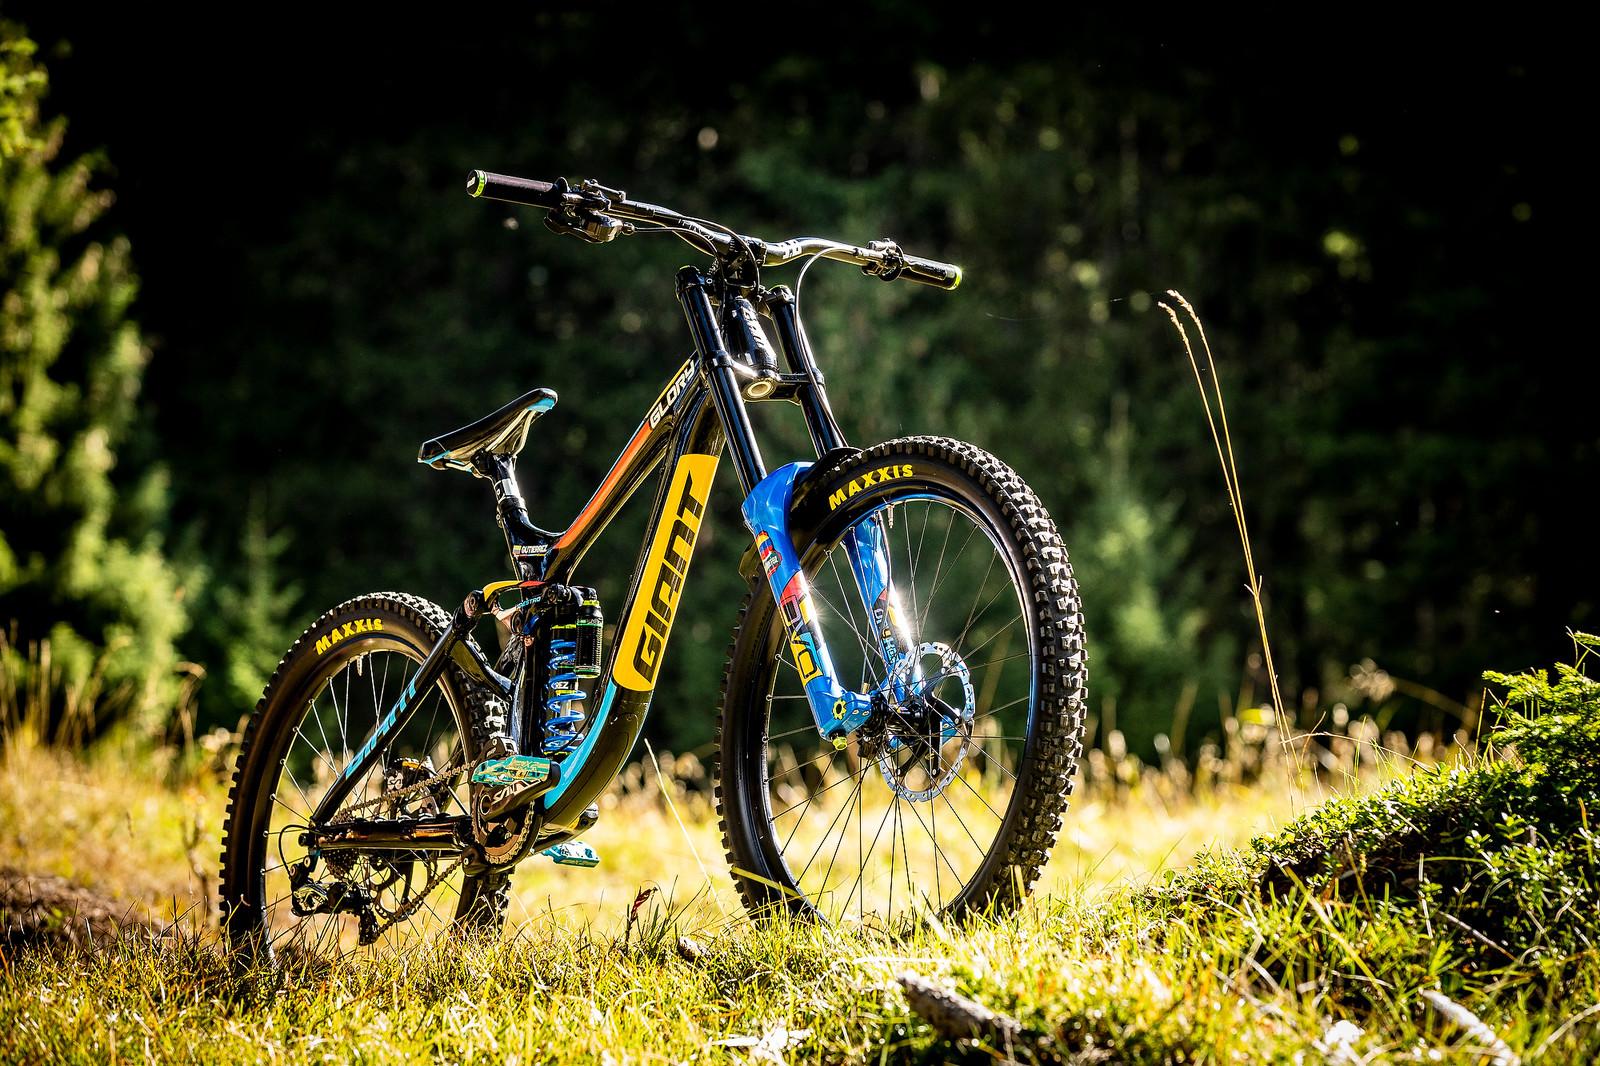 WORLD CHAMPS BIKE - Marcelo Gutierrez's Giant Glory - WORLD CHAMPS BIKE - Marcelo Gutierrez's Giant Glory - Mountain Biking Pictures - Vital MTB